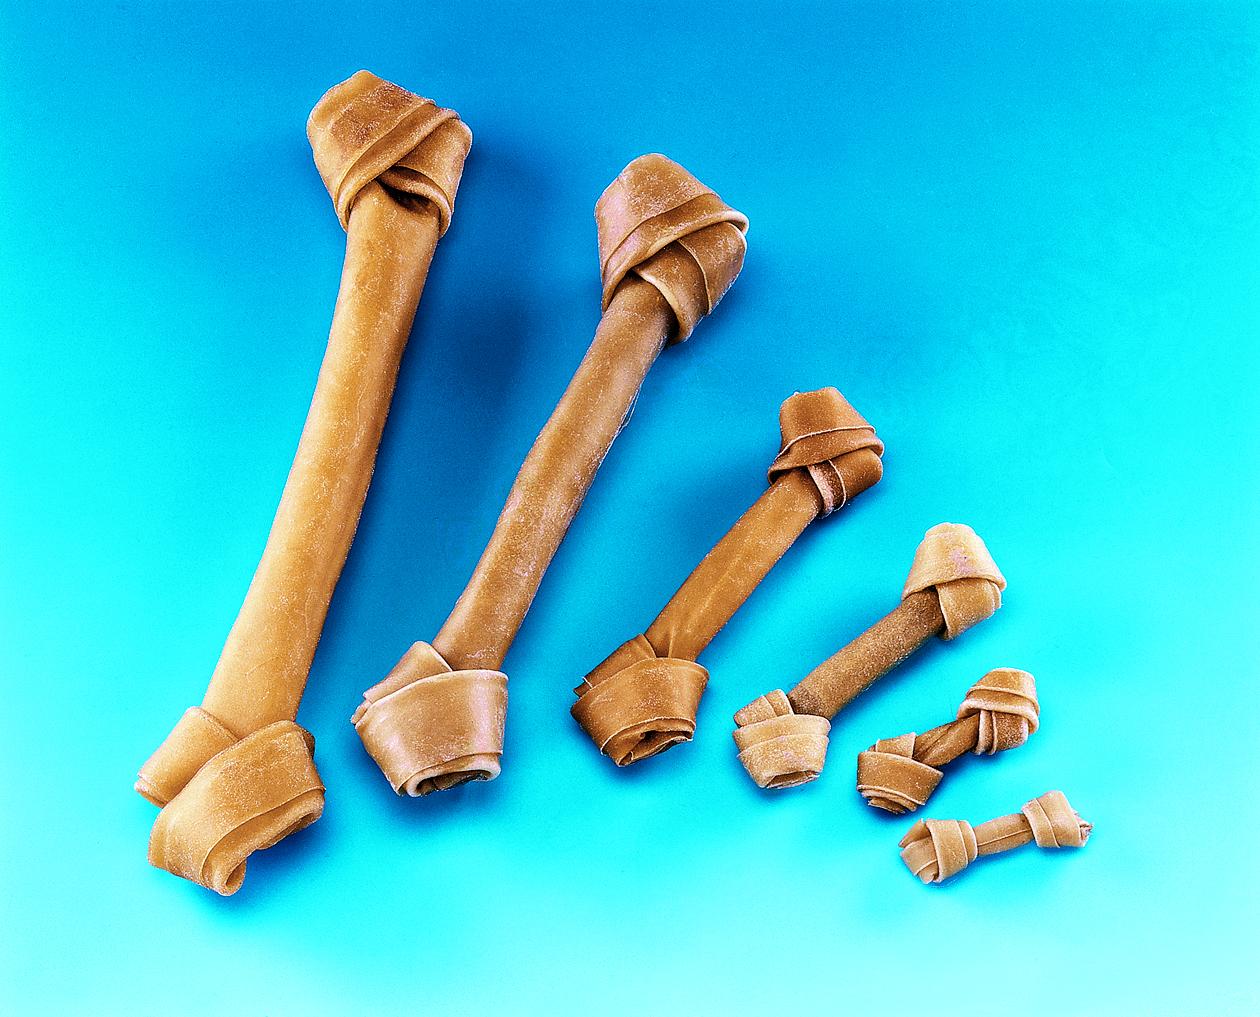 Tugg - Benknut - 12-14cm/45g - Lösvikt Thai